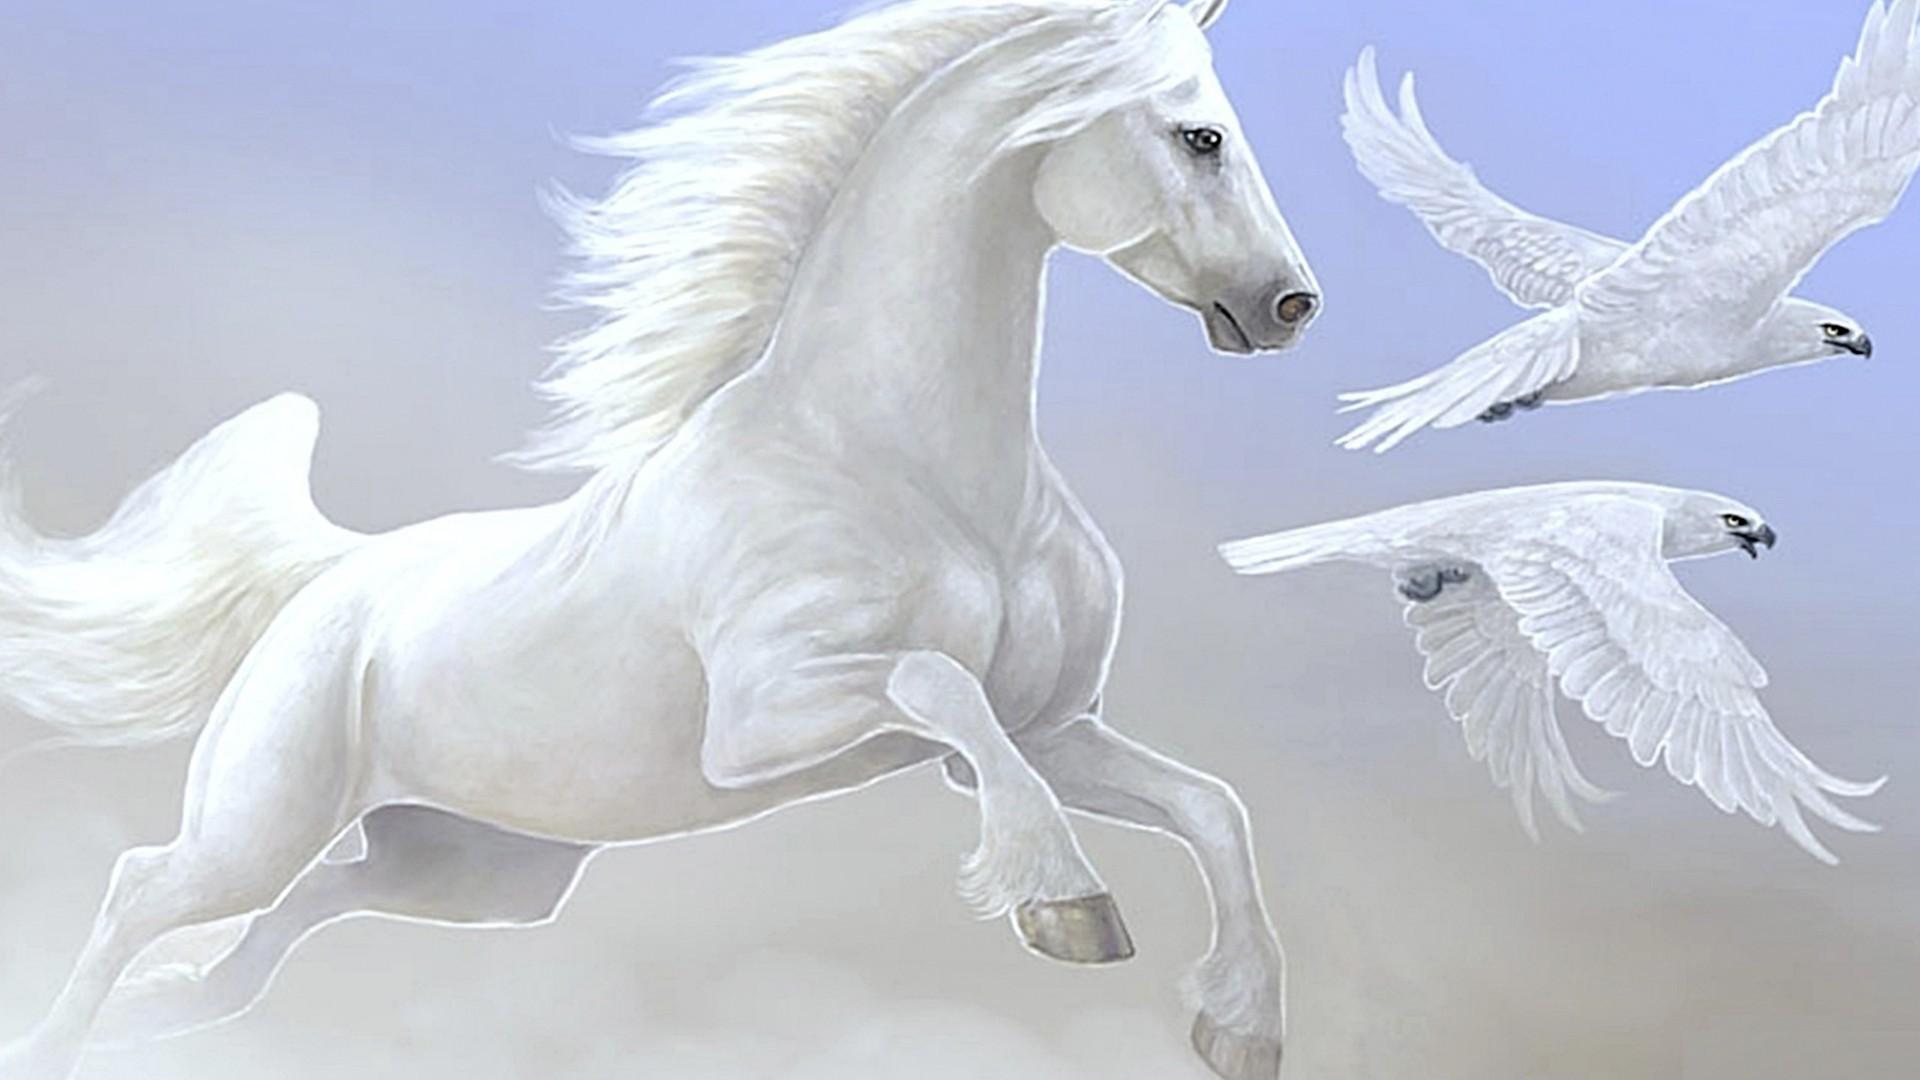 Seven Horse Wallpapers Group White Data Src Download 1920x1080 Download Hd Wallpaper Wallpapertip